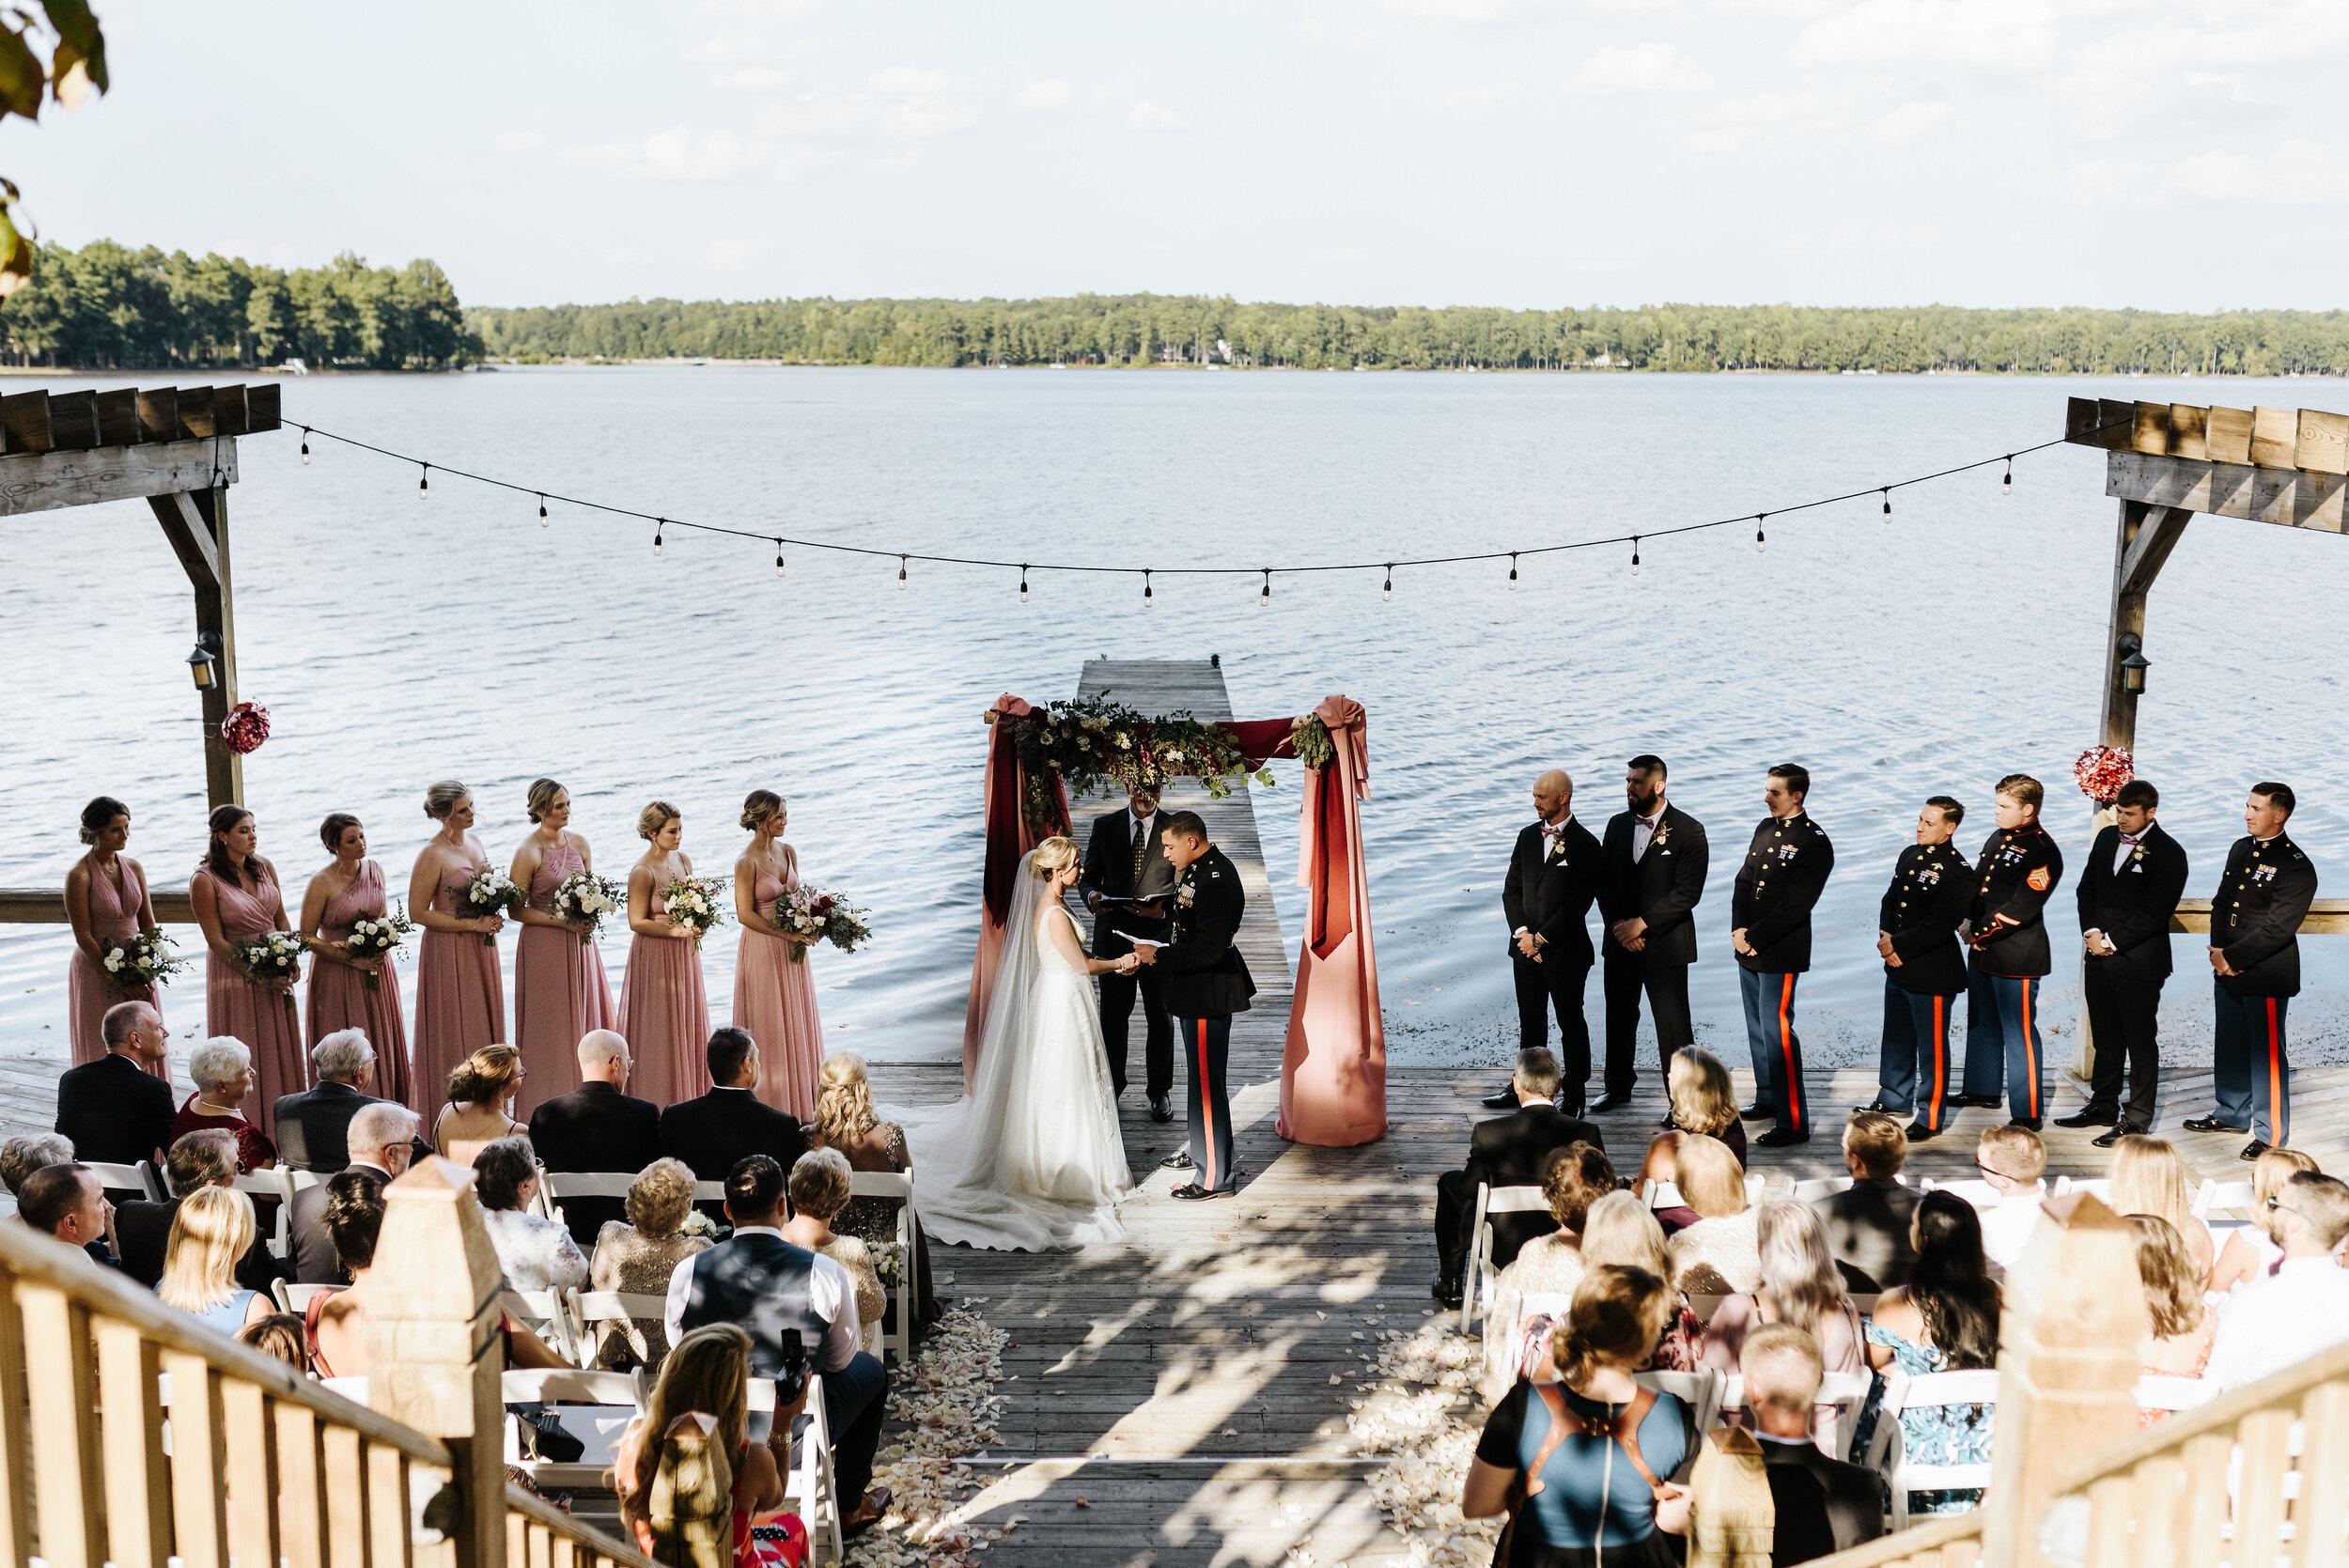 Emily_Mike_Wedding_Celebrations_at_the_Reservoir_Pool_Pavilion_Richmond_Virginia_Wedding_Photographer_Photography_by_V_47.jpg